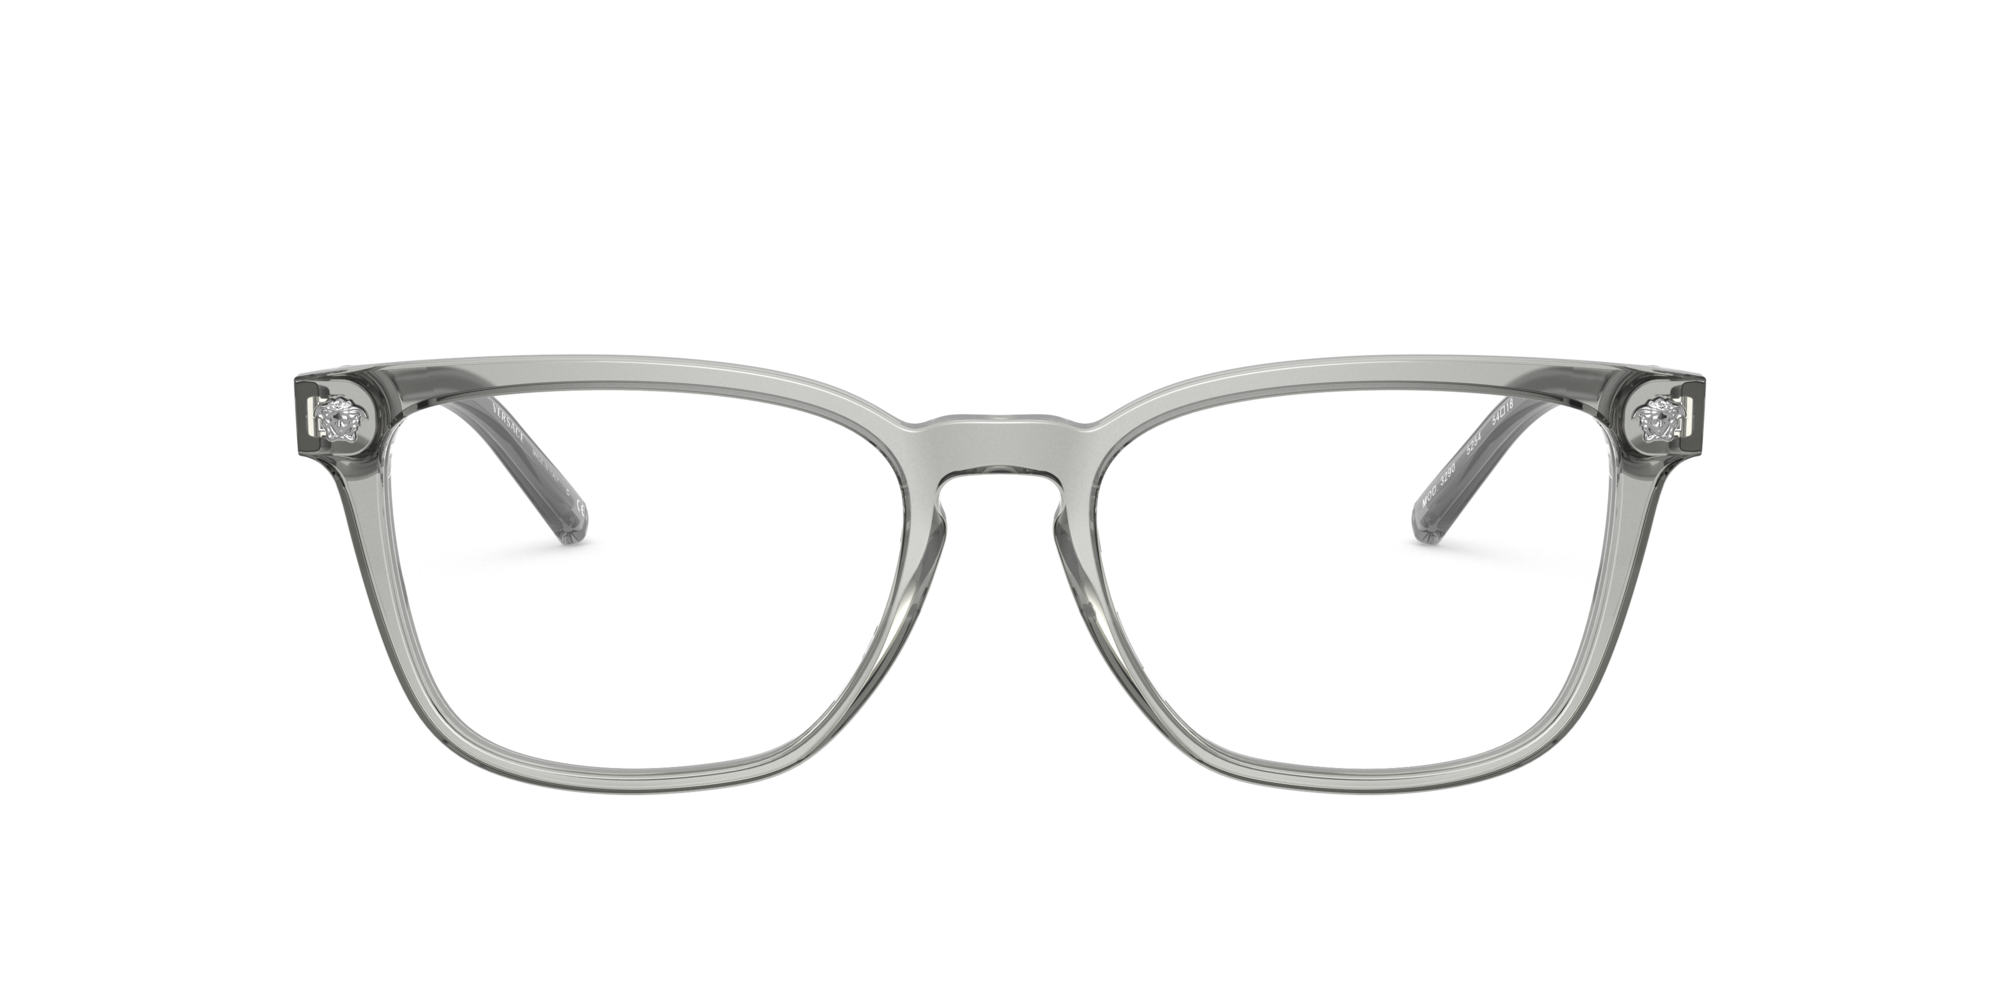 Image for VE3290 from LensCrafters | Glasses, Prescription Glasses Online, Eyewear